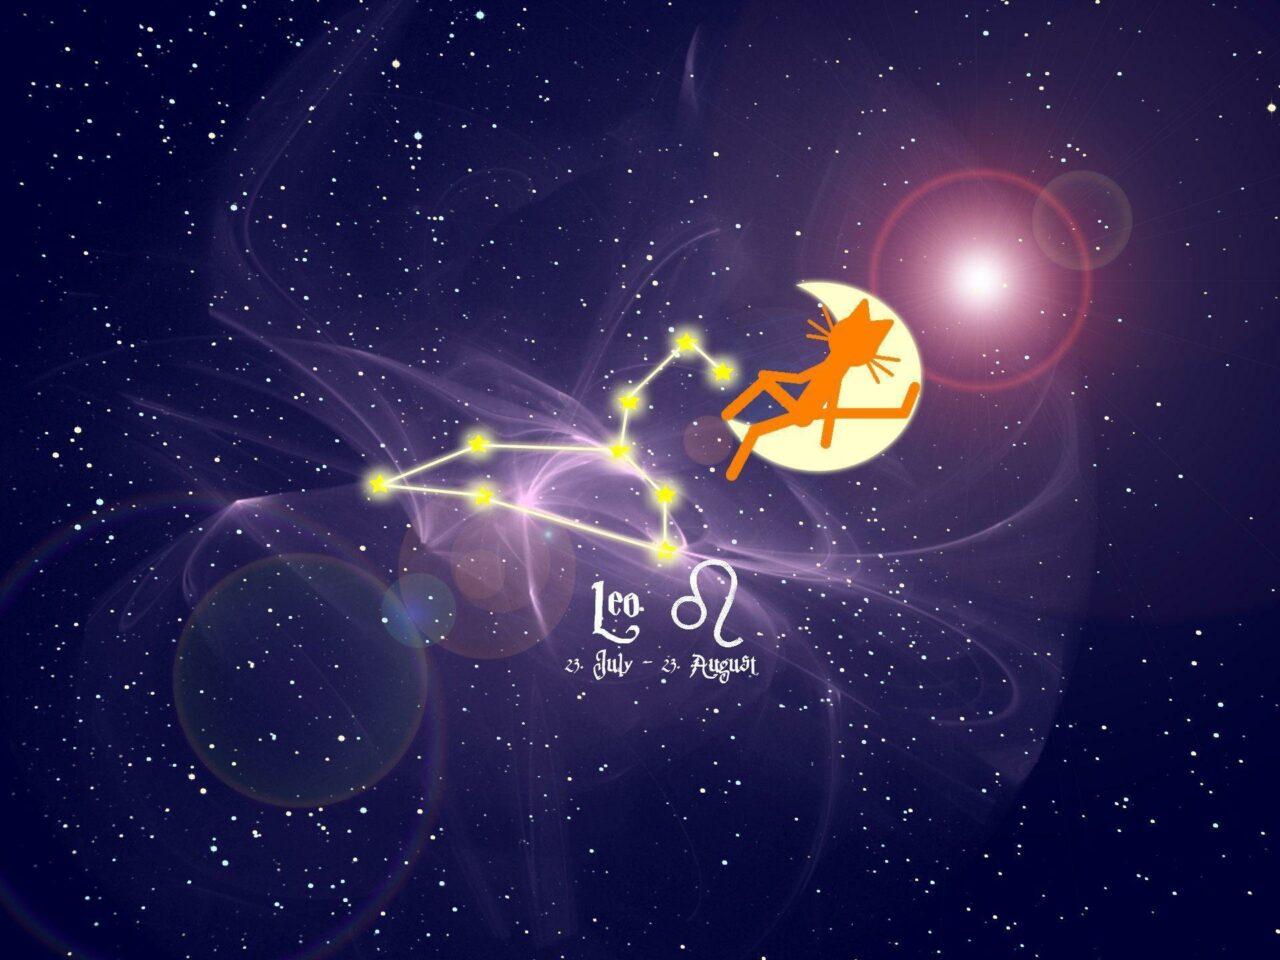 https://nightfallastrology.com/wp-content/uploads/2021/07/leo-zodiac-sign-1280x960.jpg